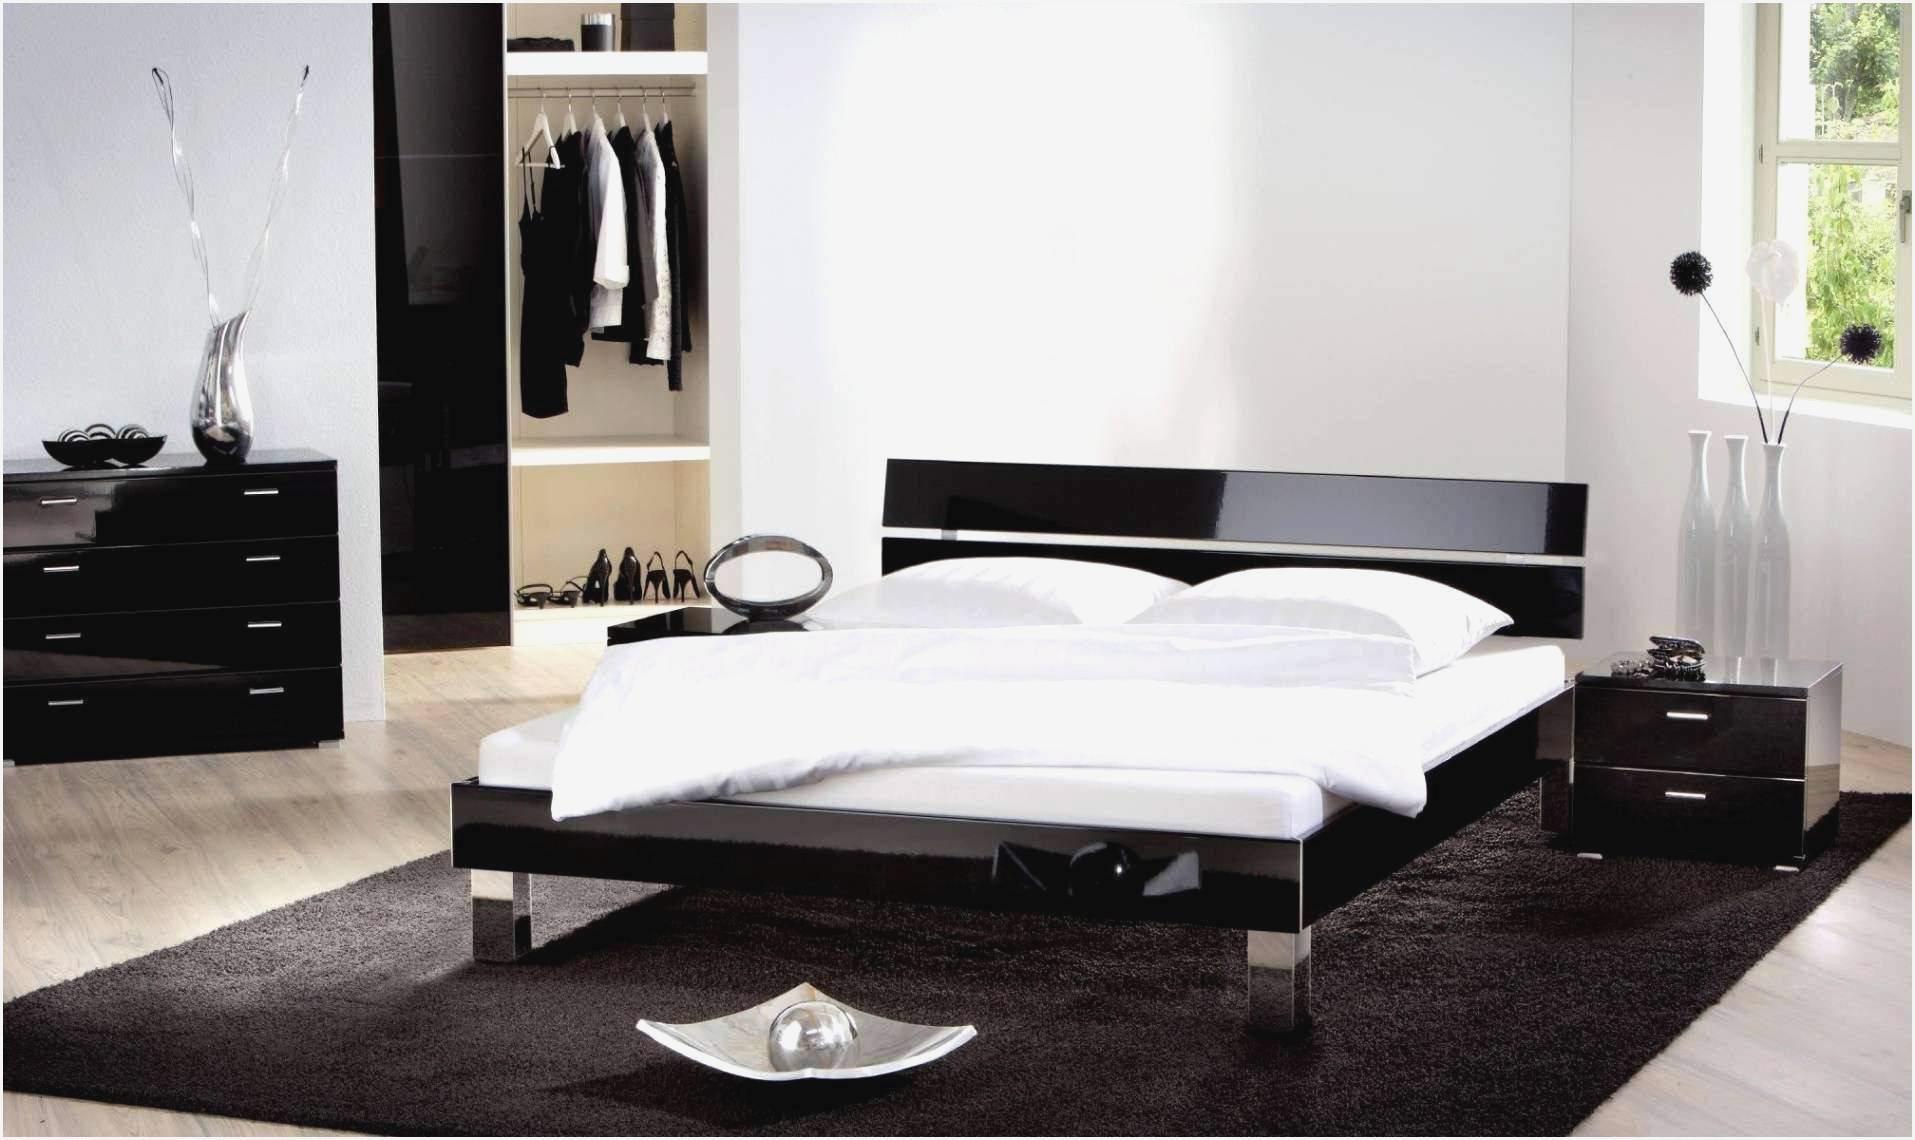 18 Ideen F?r Landhaus Schlafzimmer Awesome Ideen F?r